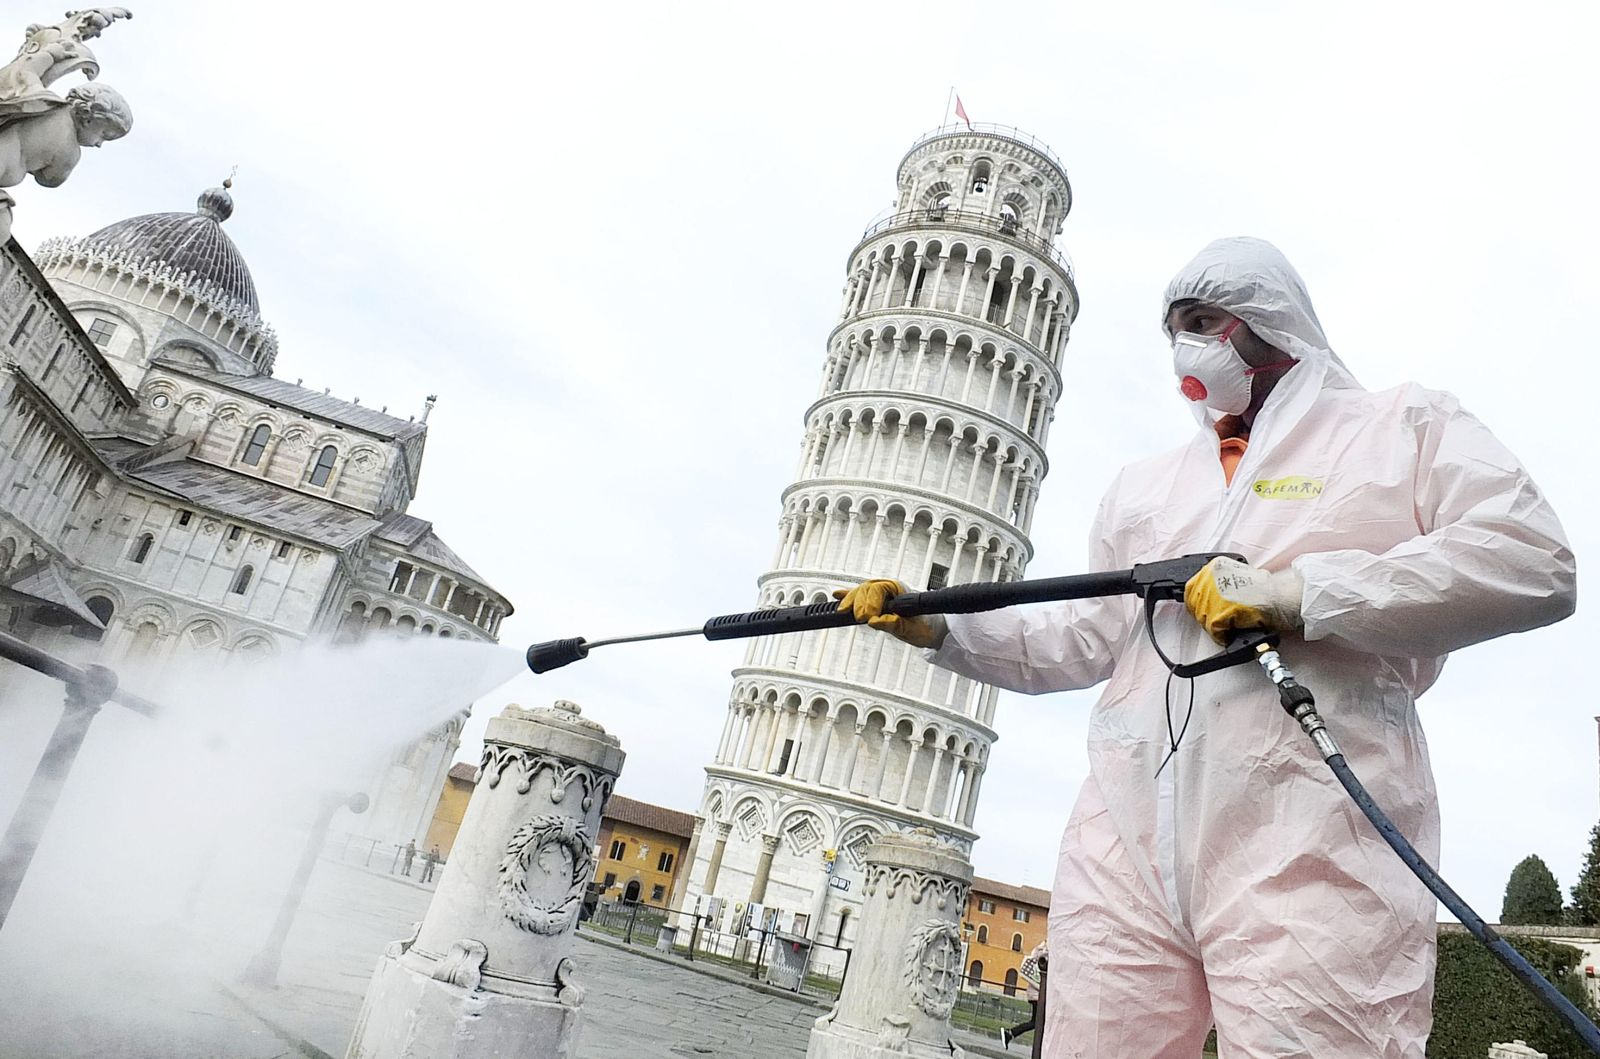 Italy under lockdown over coronavirus, Pisa - 17 Mar 2020